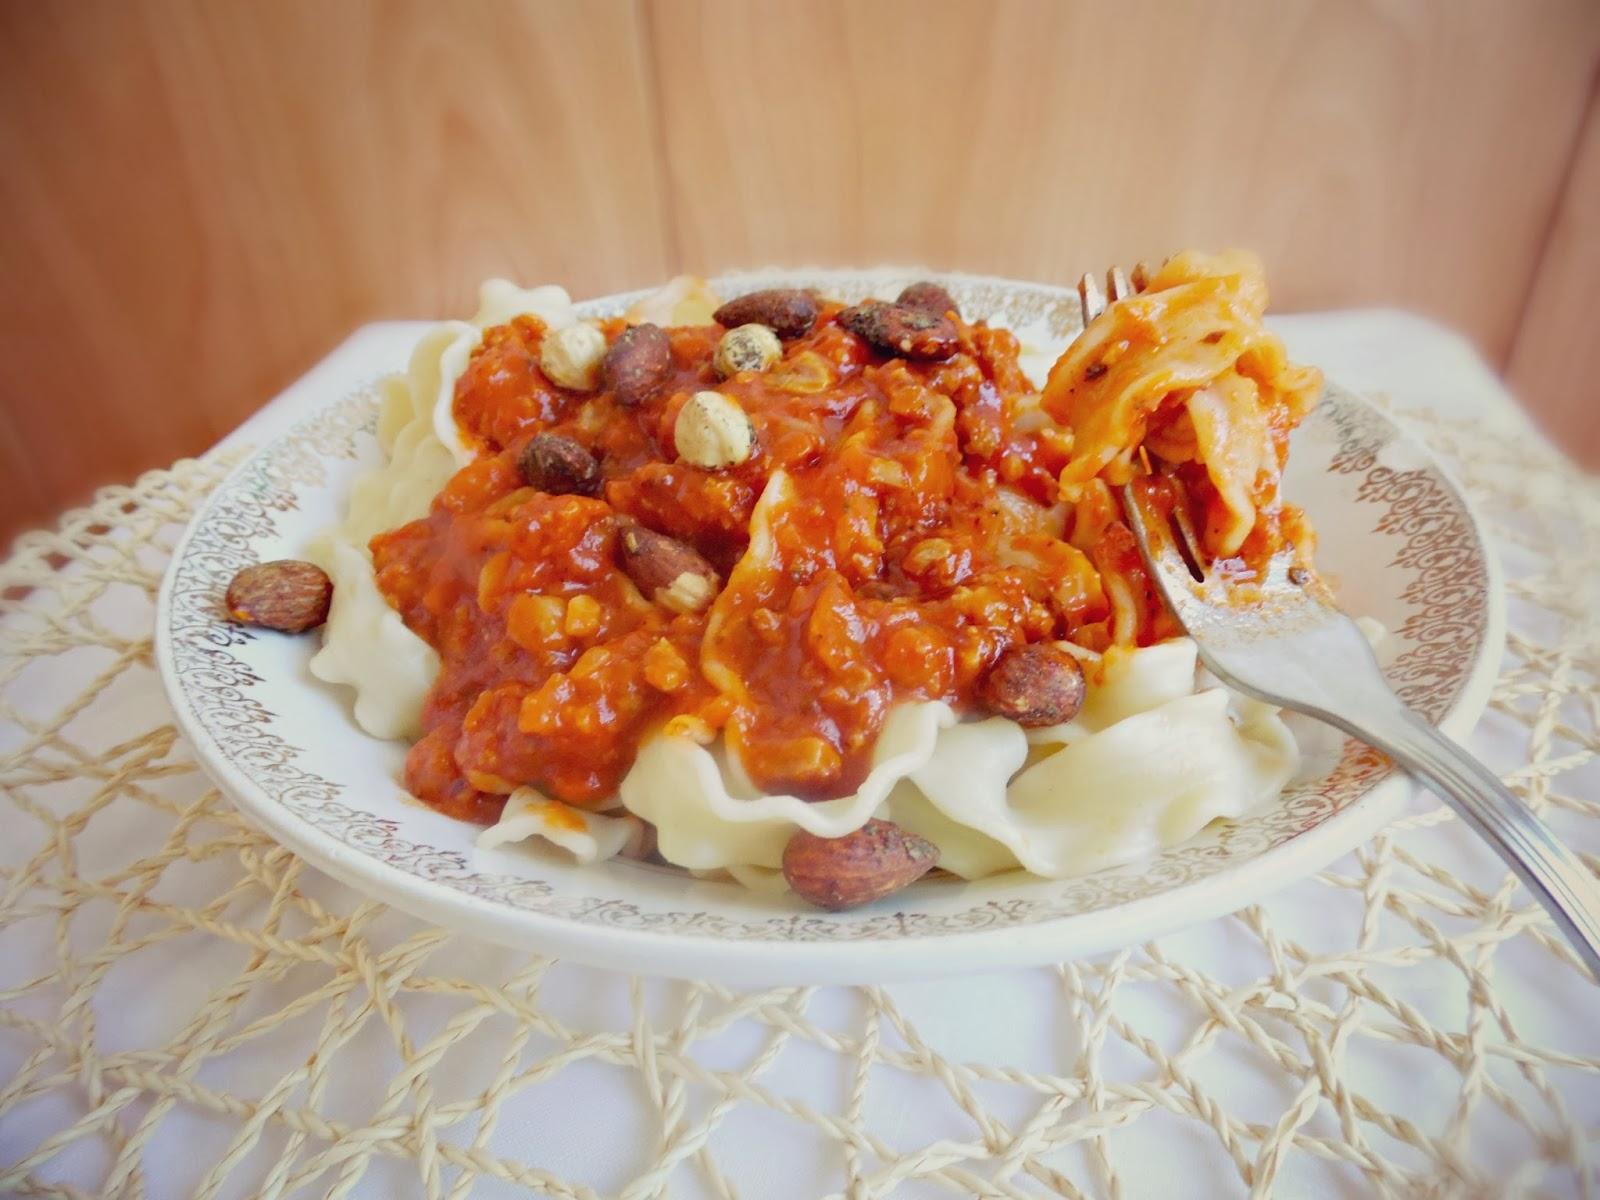 http://www.experimentando-enla-cocina.blogspot.com.es/2013/10/mafaldine-al-toque-borges.html